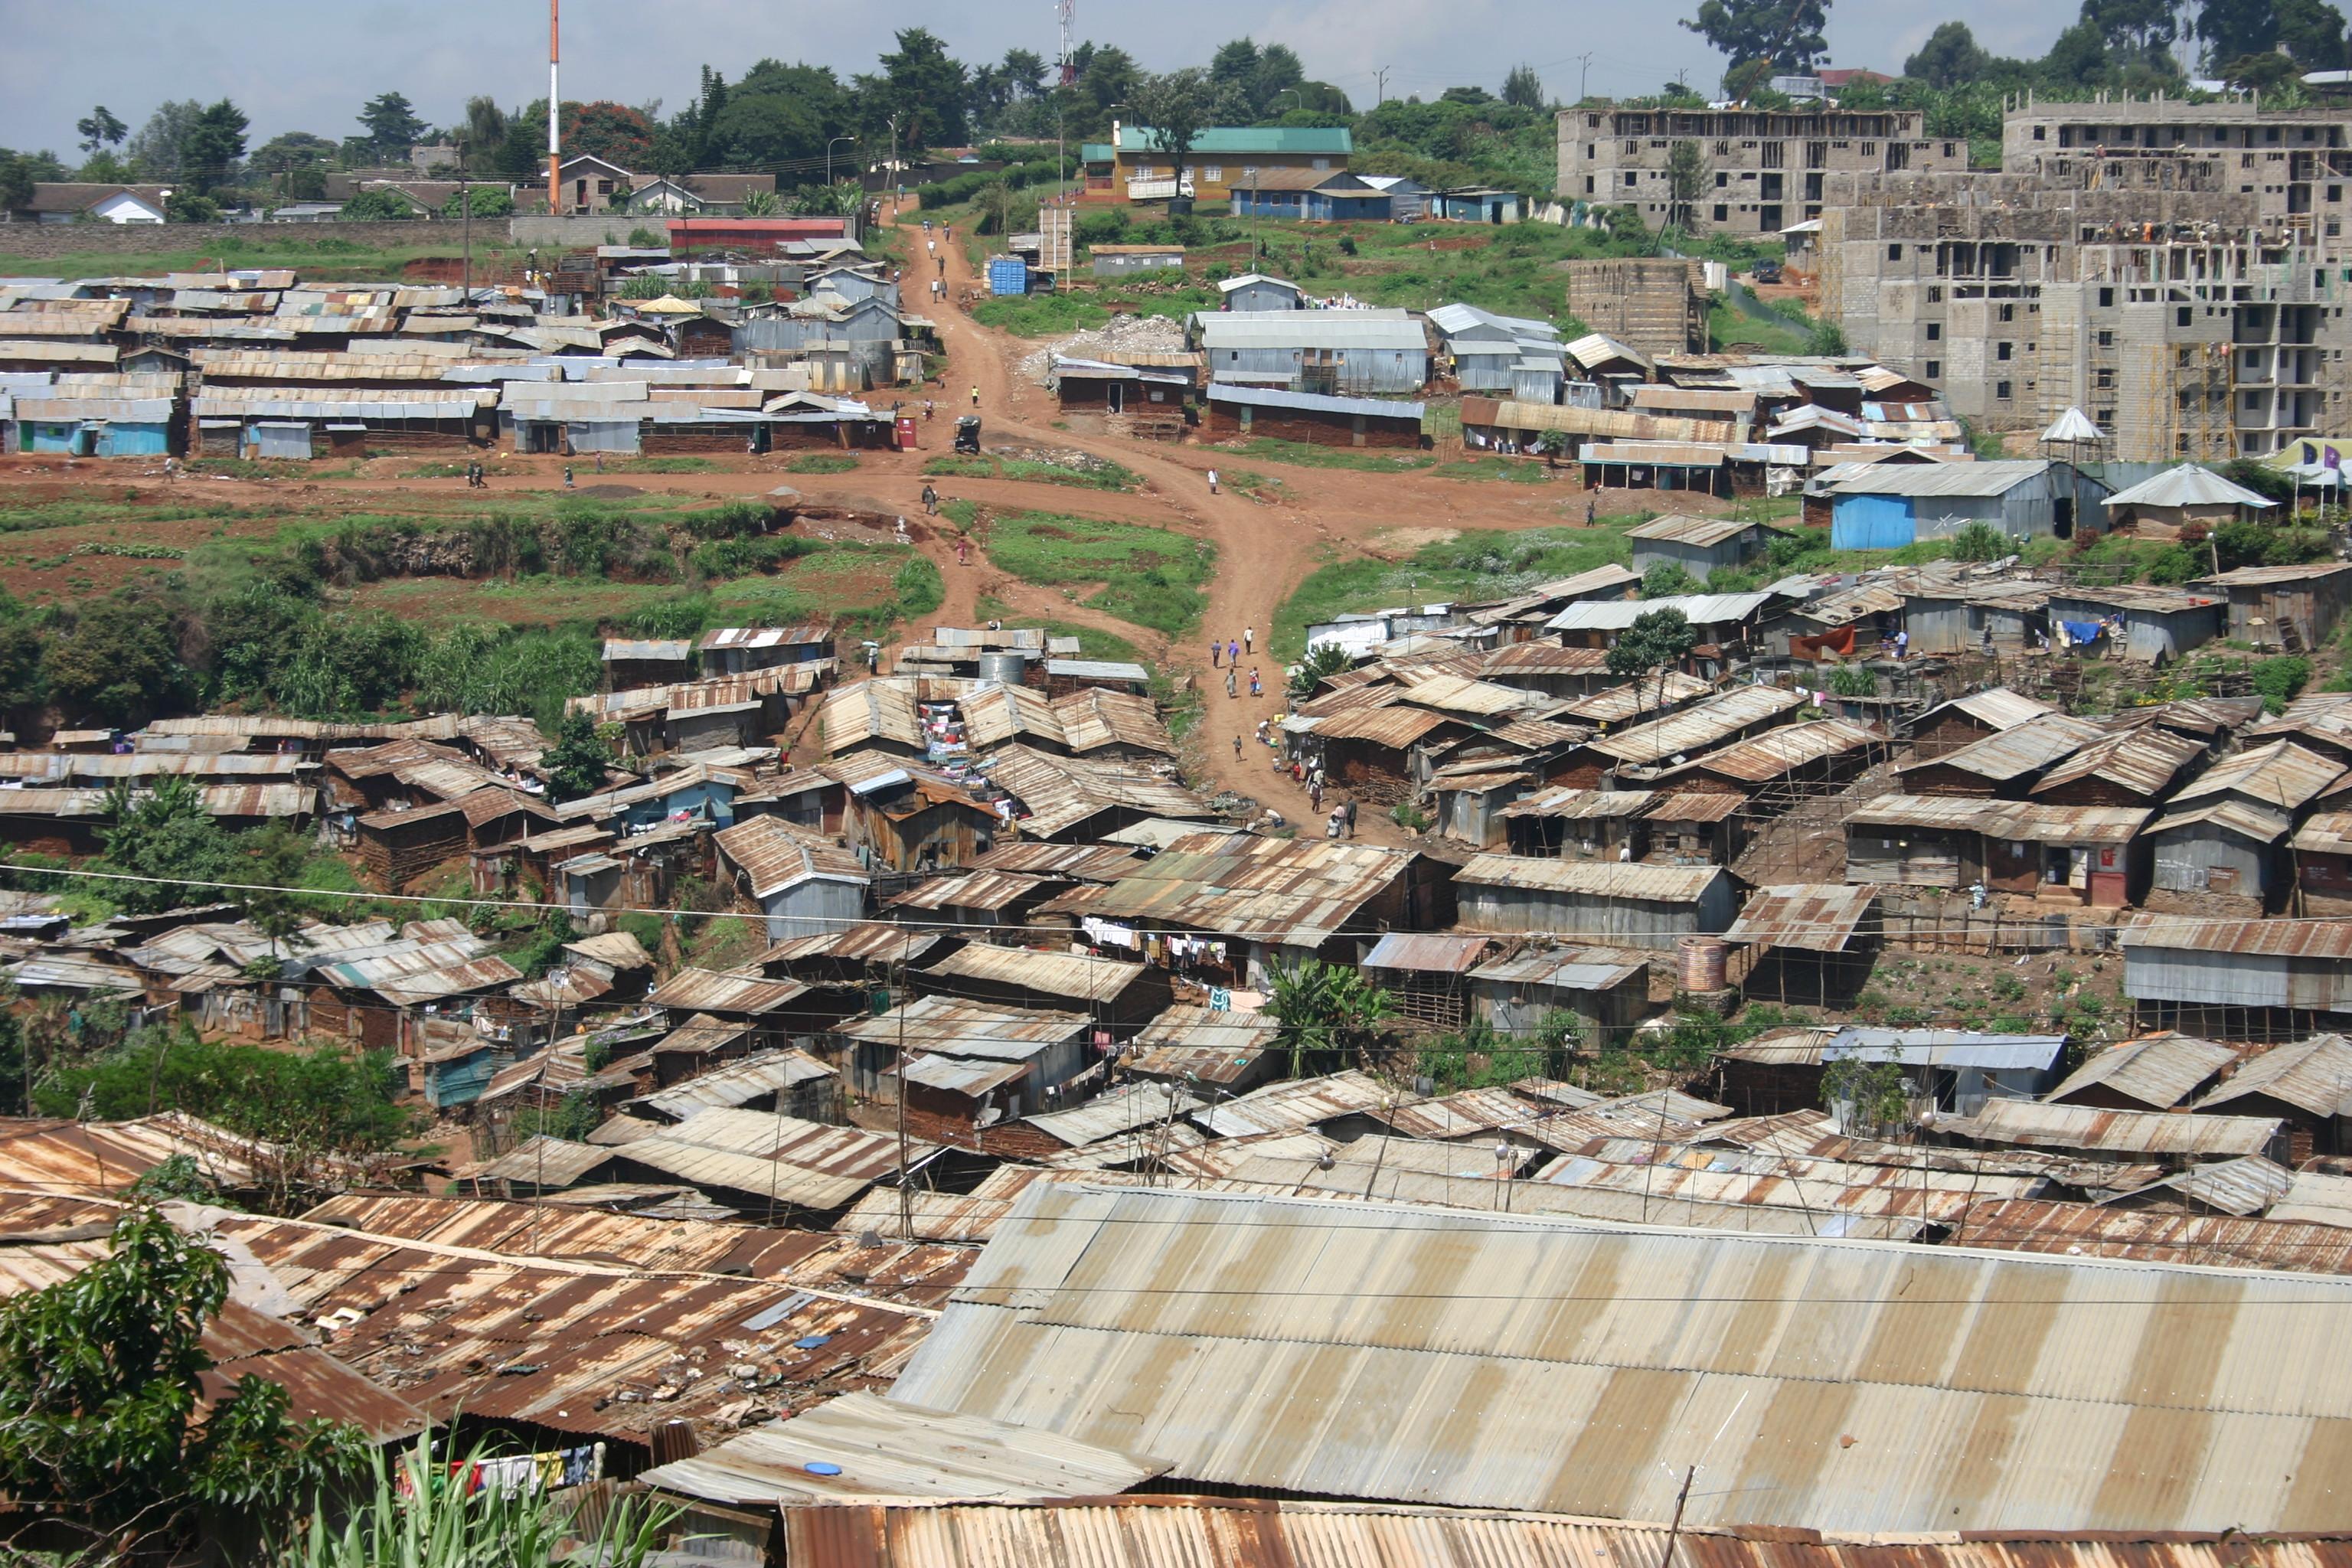 kibera slum Photo's by chad holder photography .